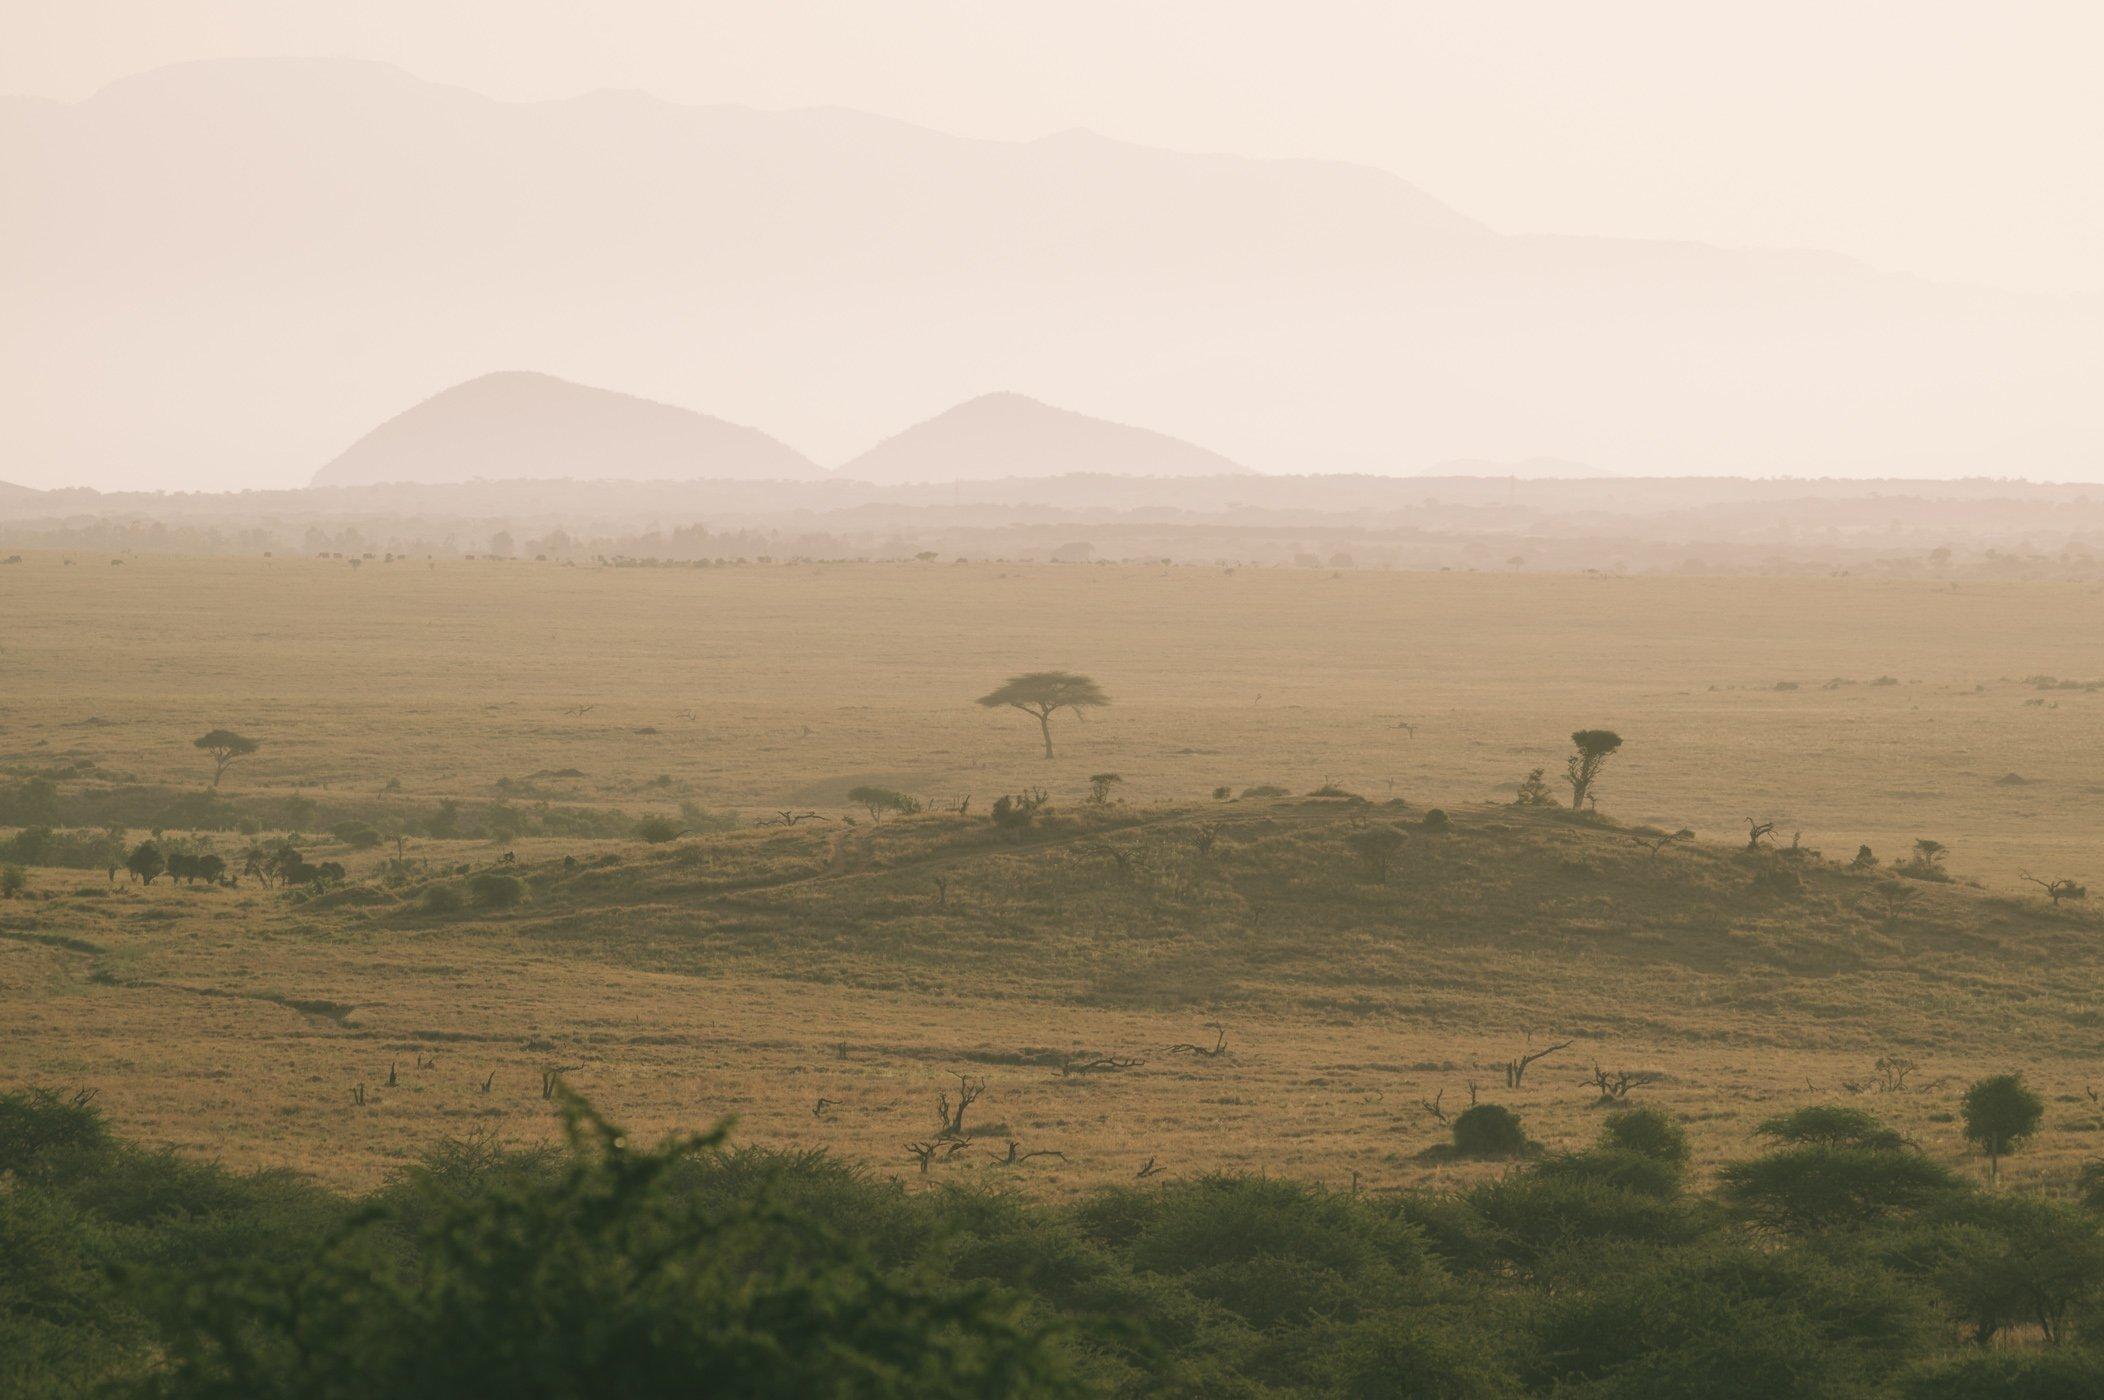 Lewa Conservancy Kenya